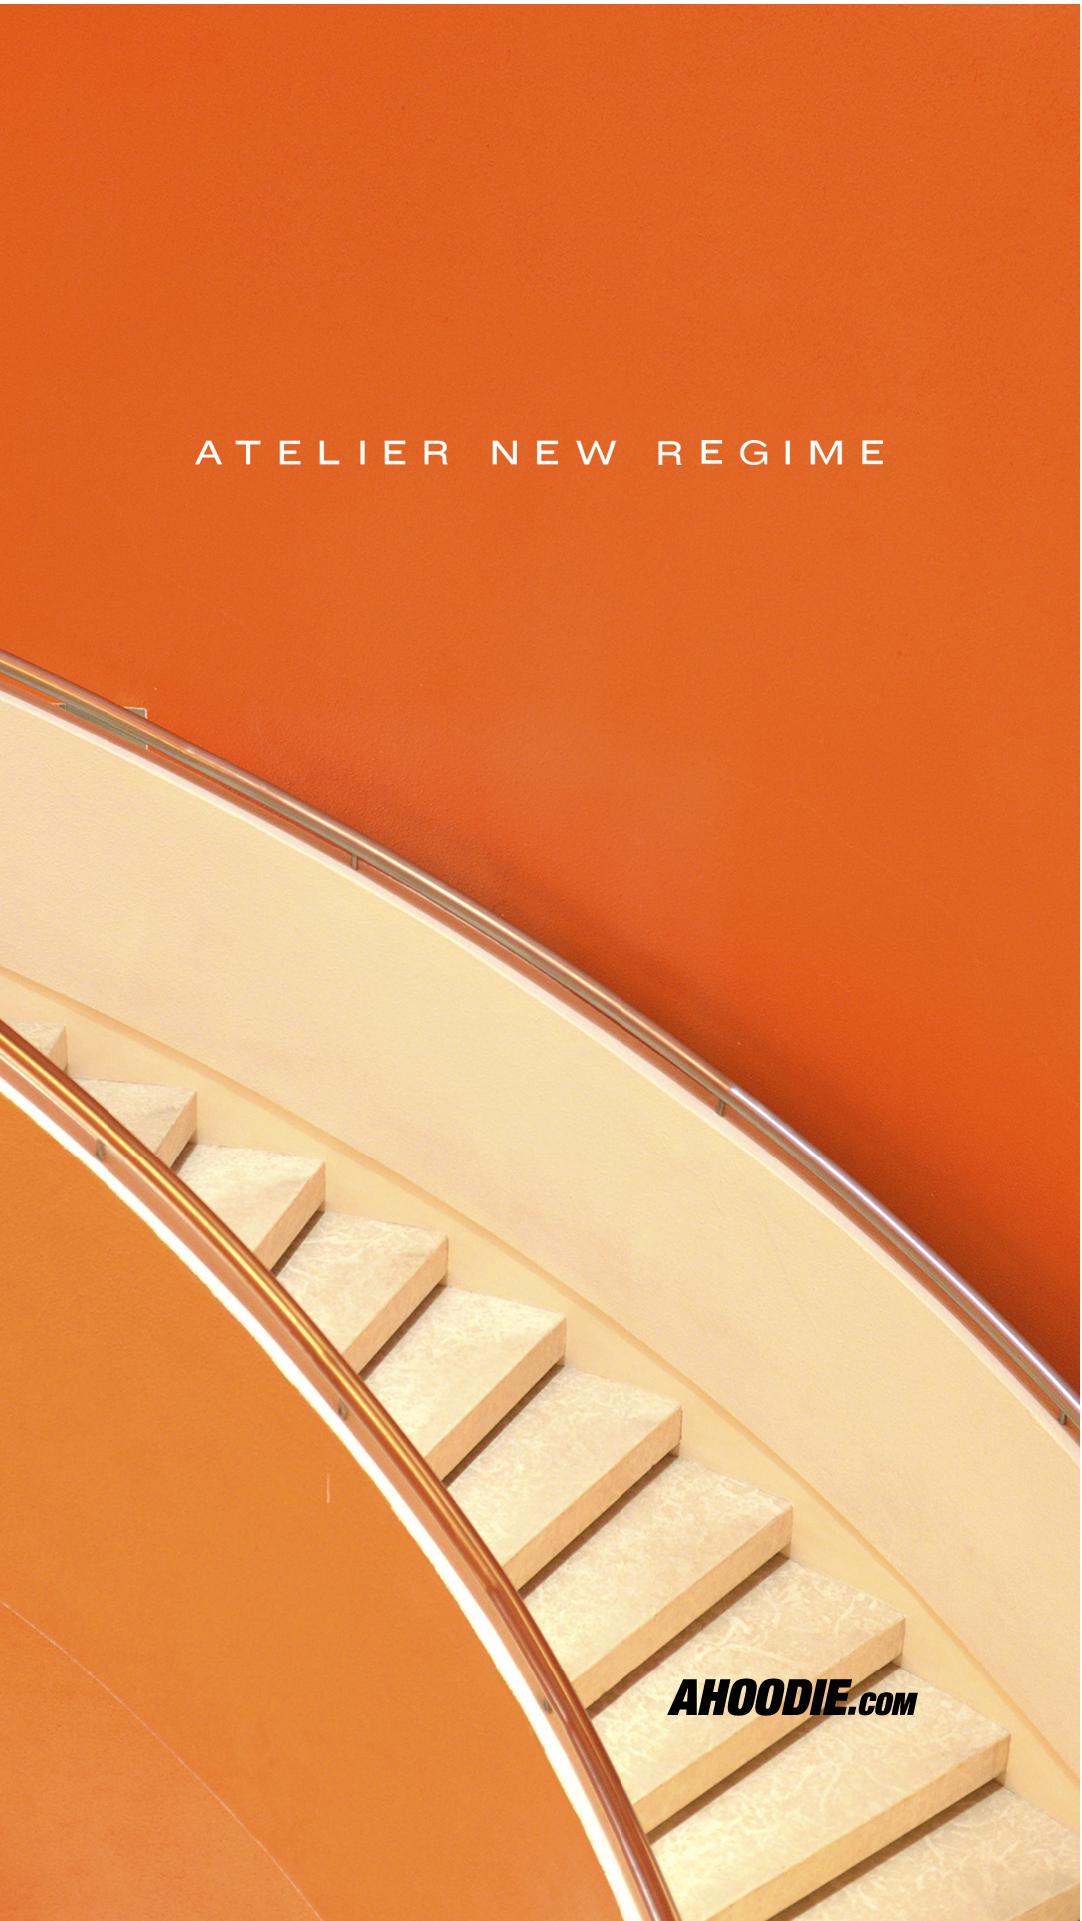 Atelier New Regime - Higher